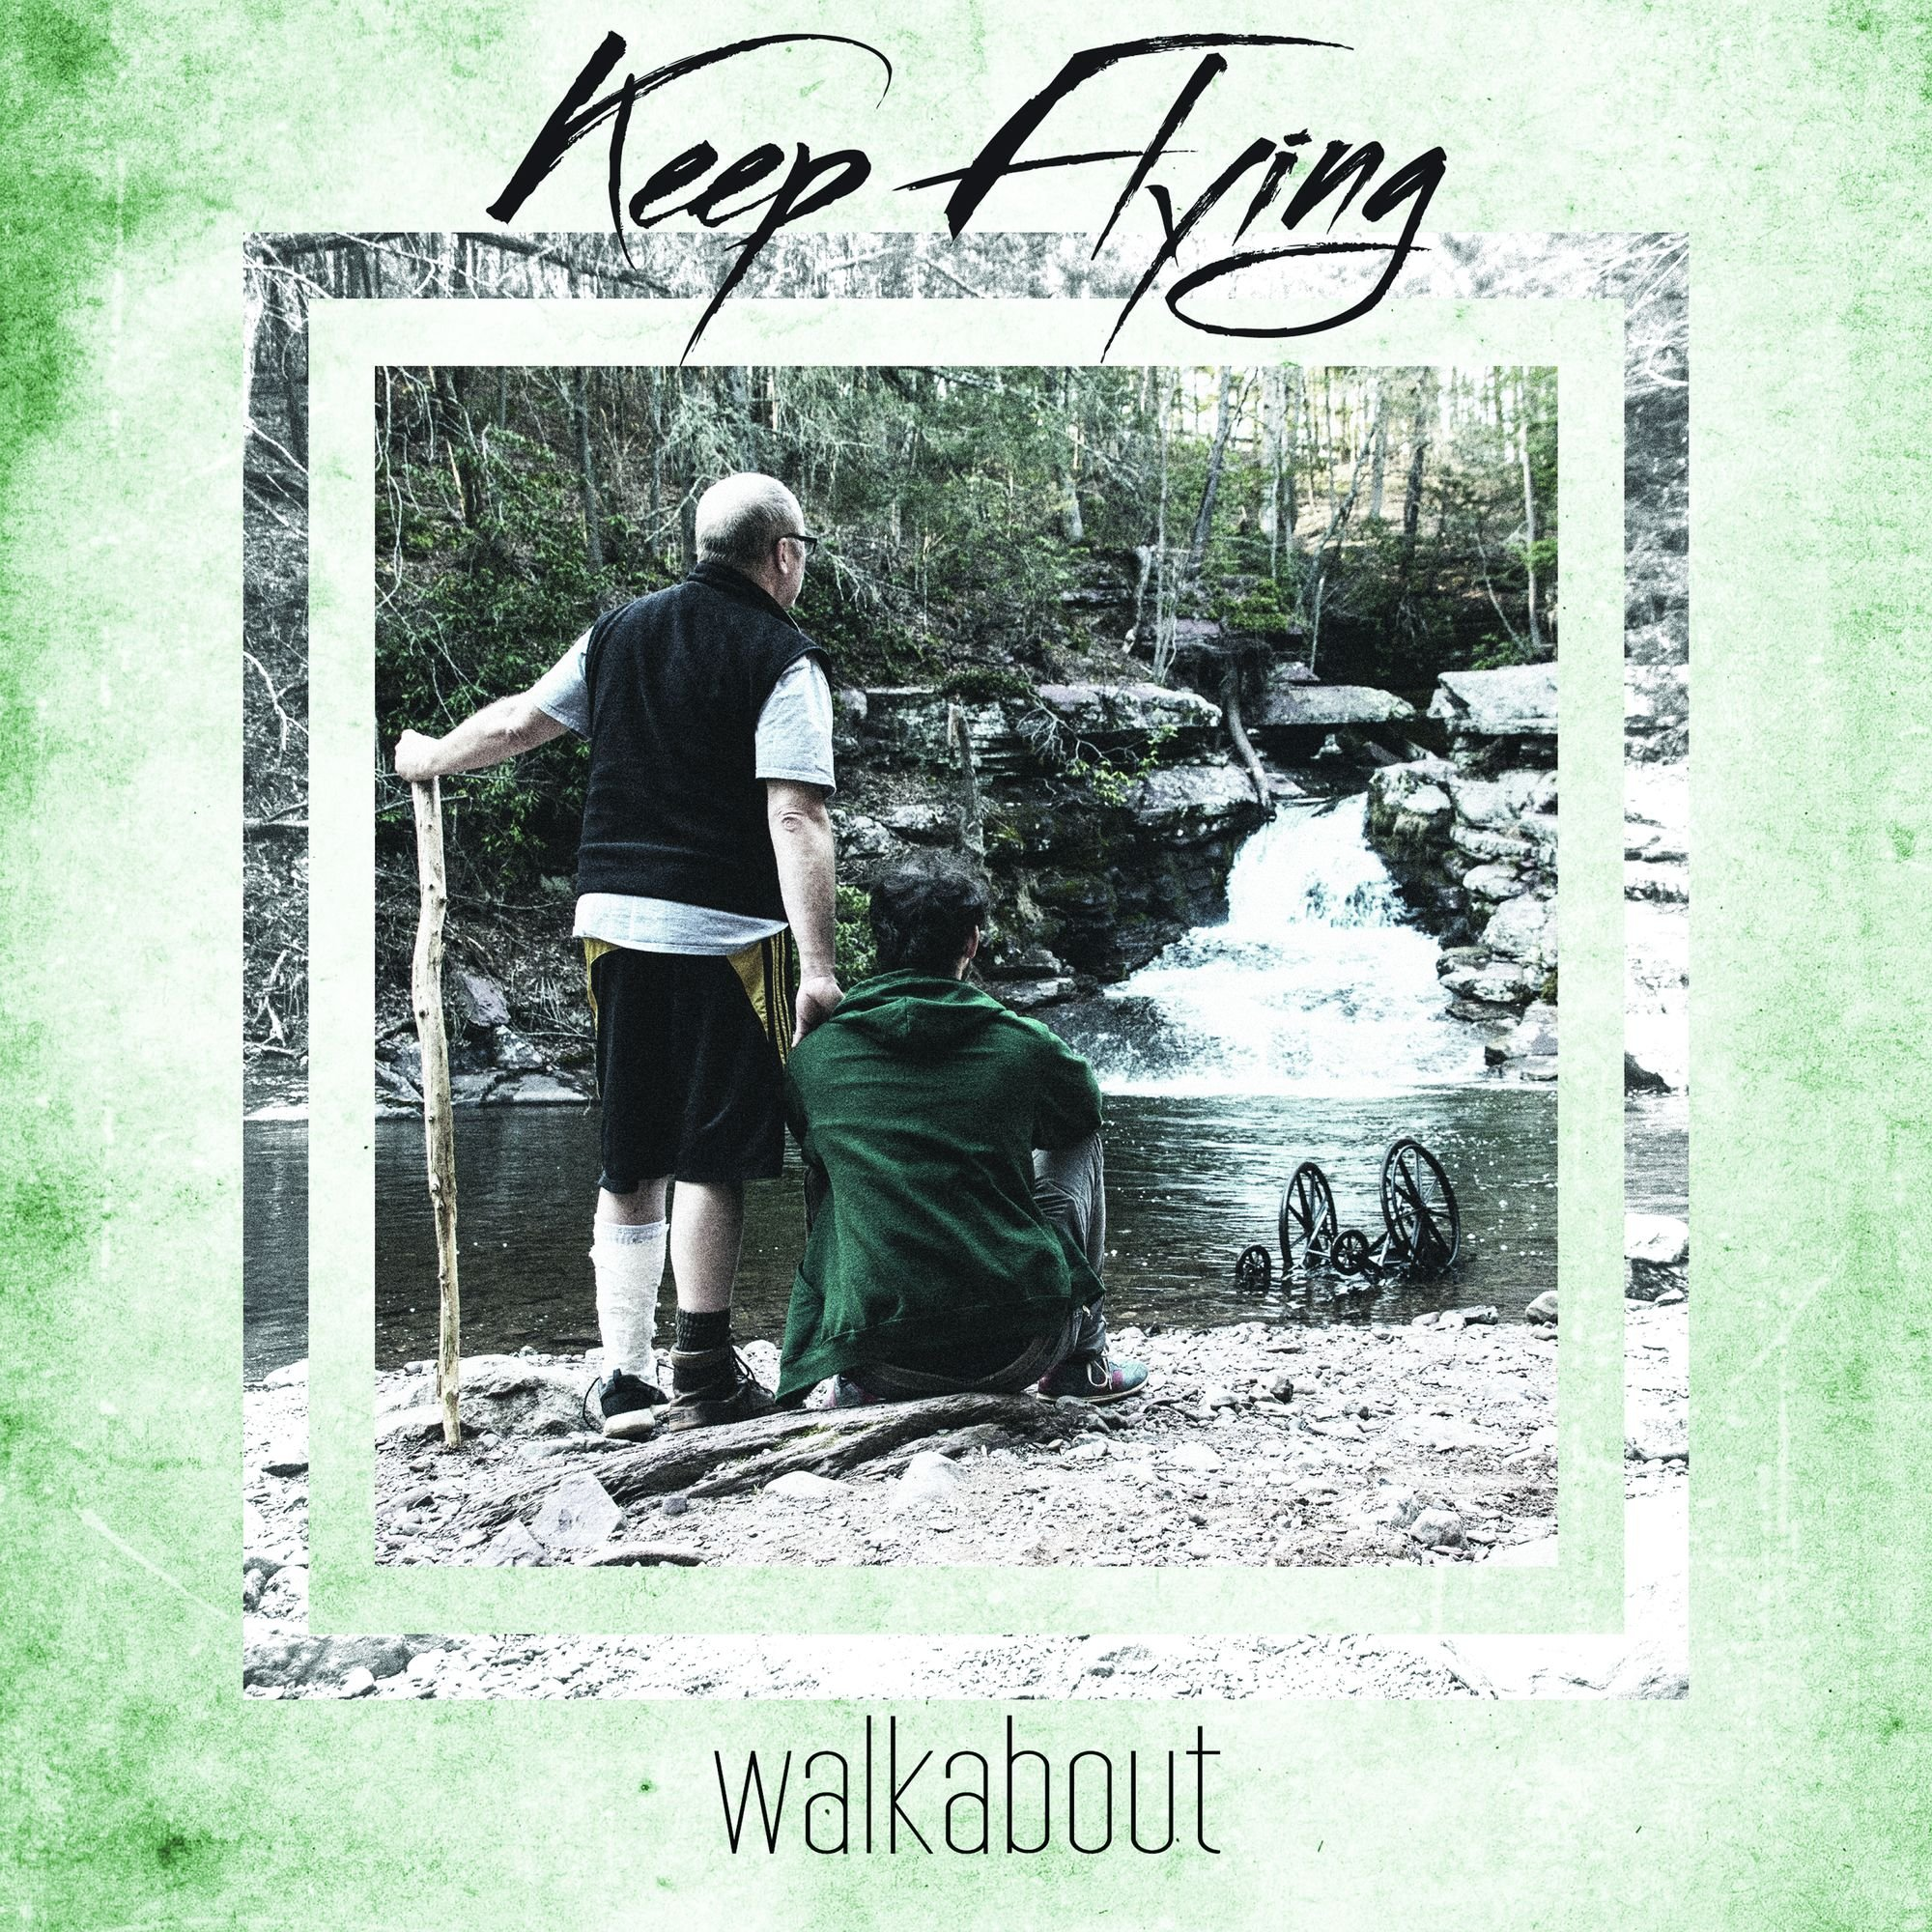 Vinilo : Keep Flying - Walkabout /  Follow Your Nightmares (LP Vinyl)